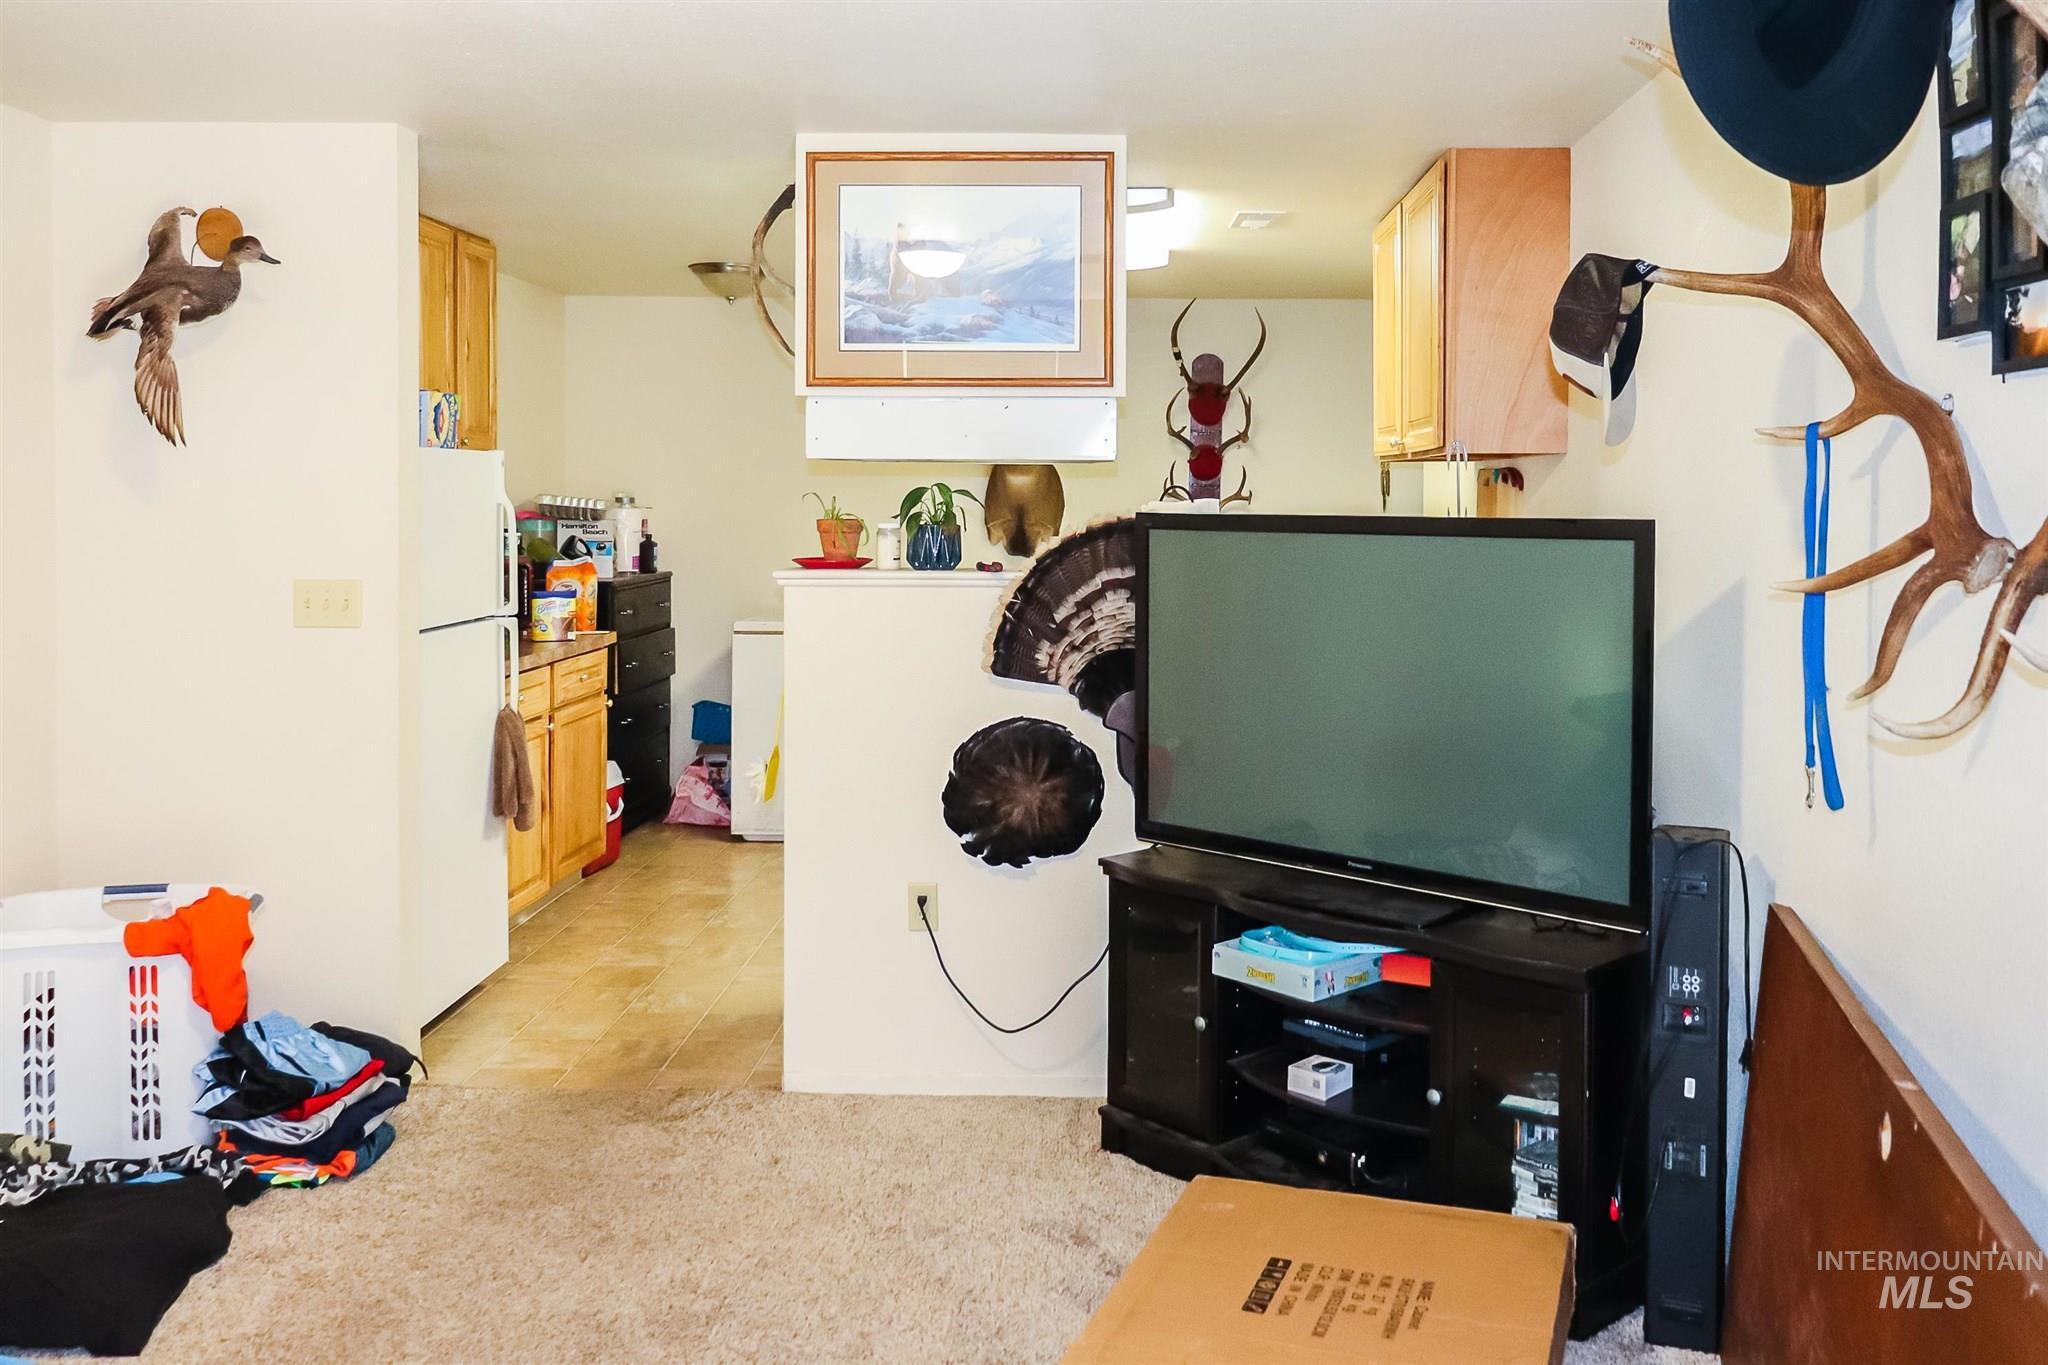 616 S Harrison Property Photo 25